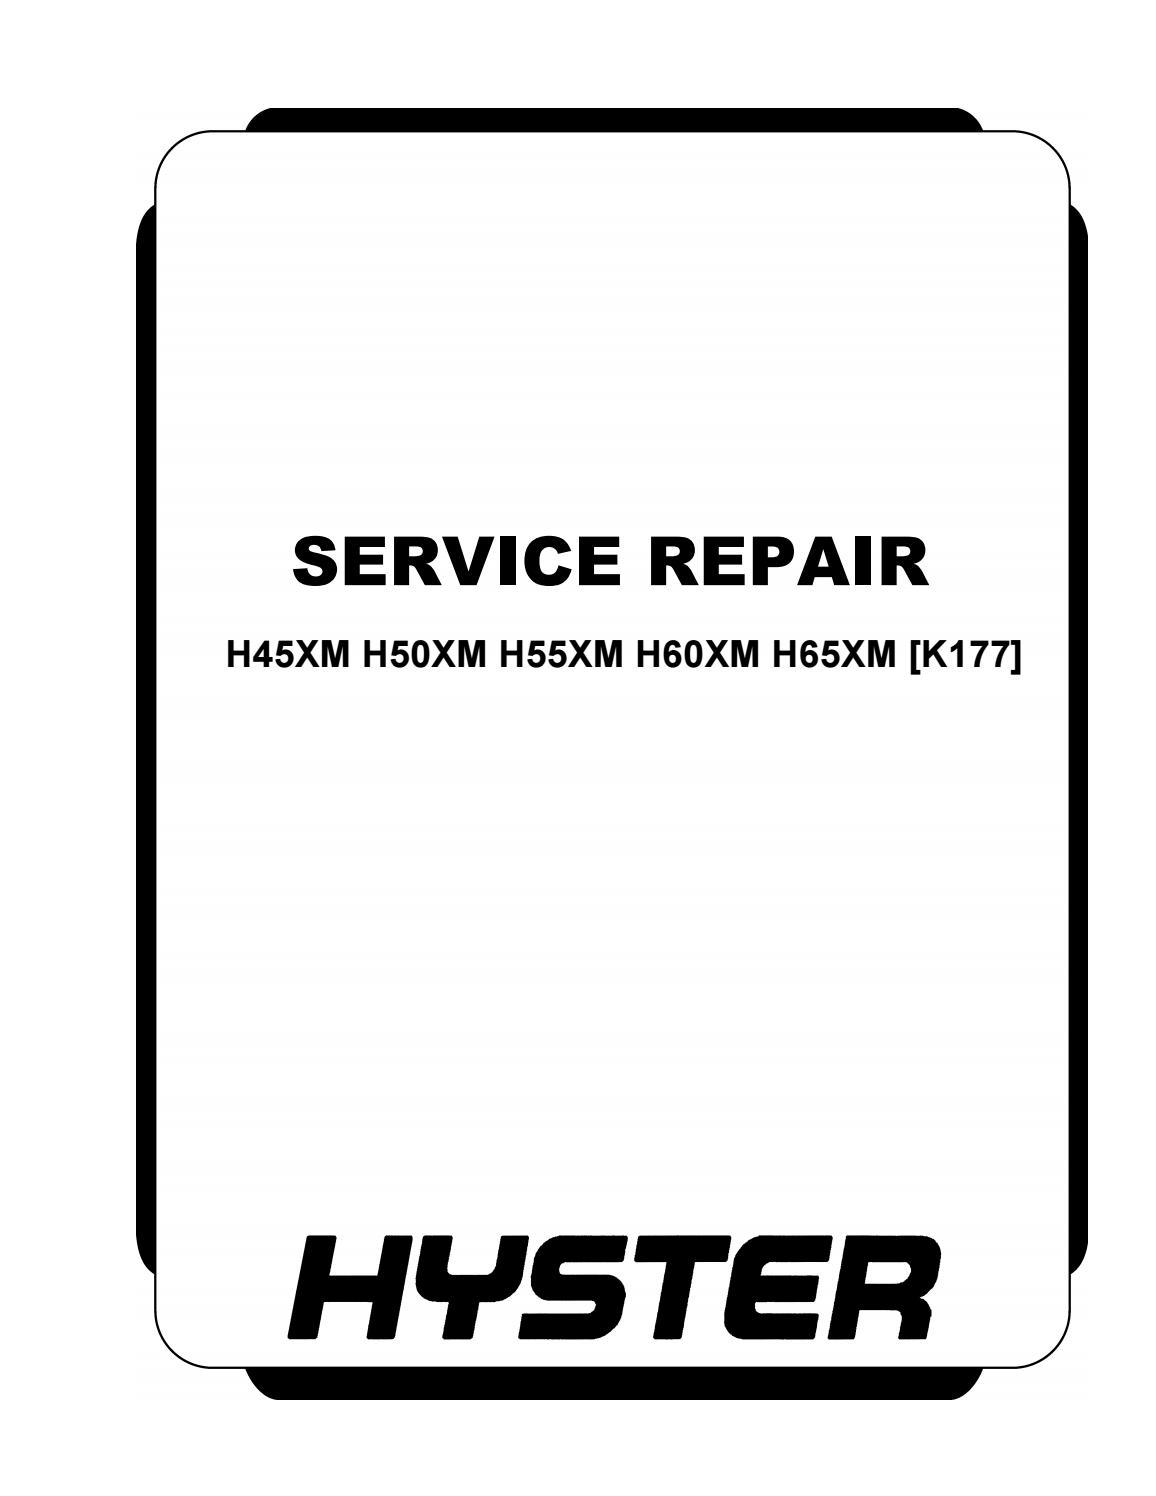 Hyster (K177) H65XM Forklift Service Repair Manual by 163114103 - issuu | Hyster Forklift Wiring Schematics 1990 |  | Issuu